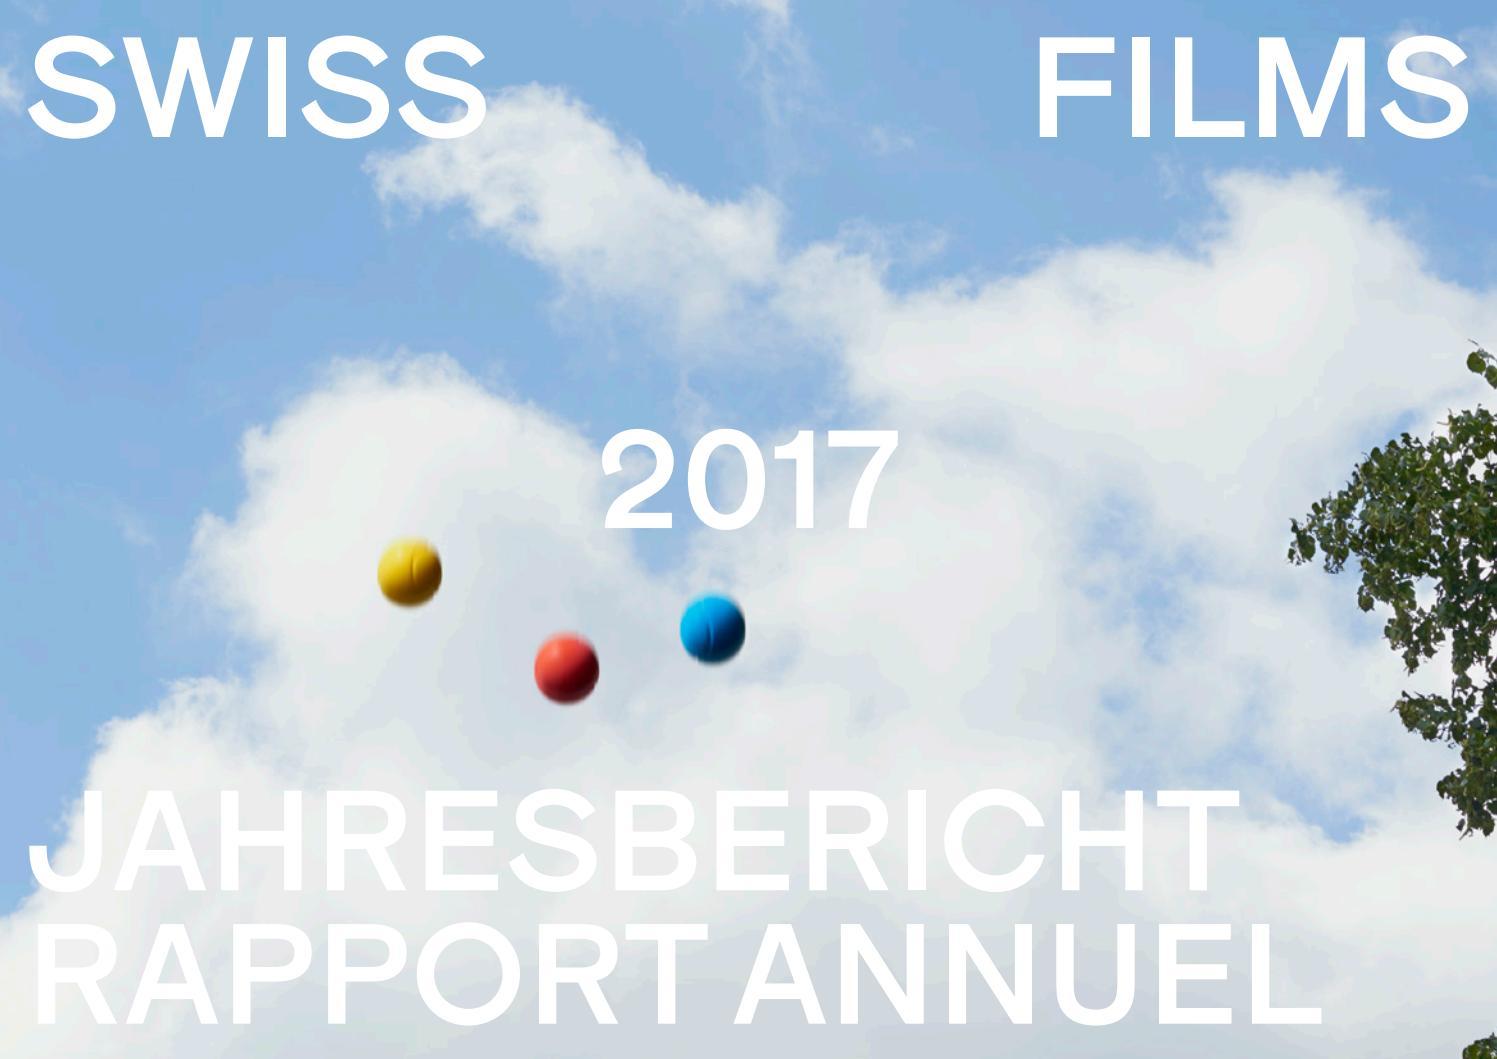 Jahresbericht Rapport Annuel 2017 By Swiss Films Issuu